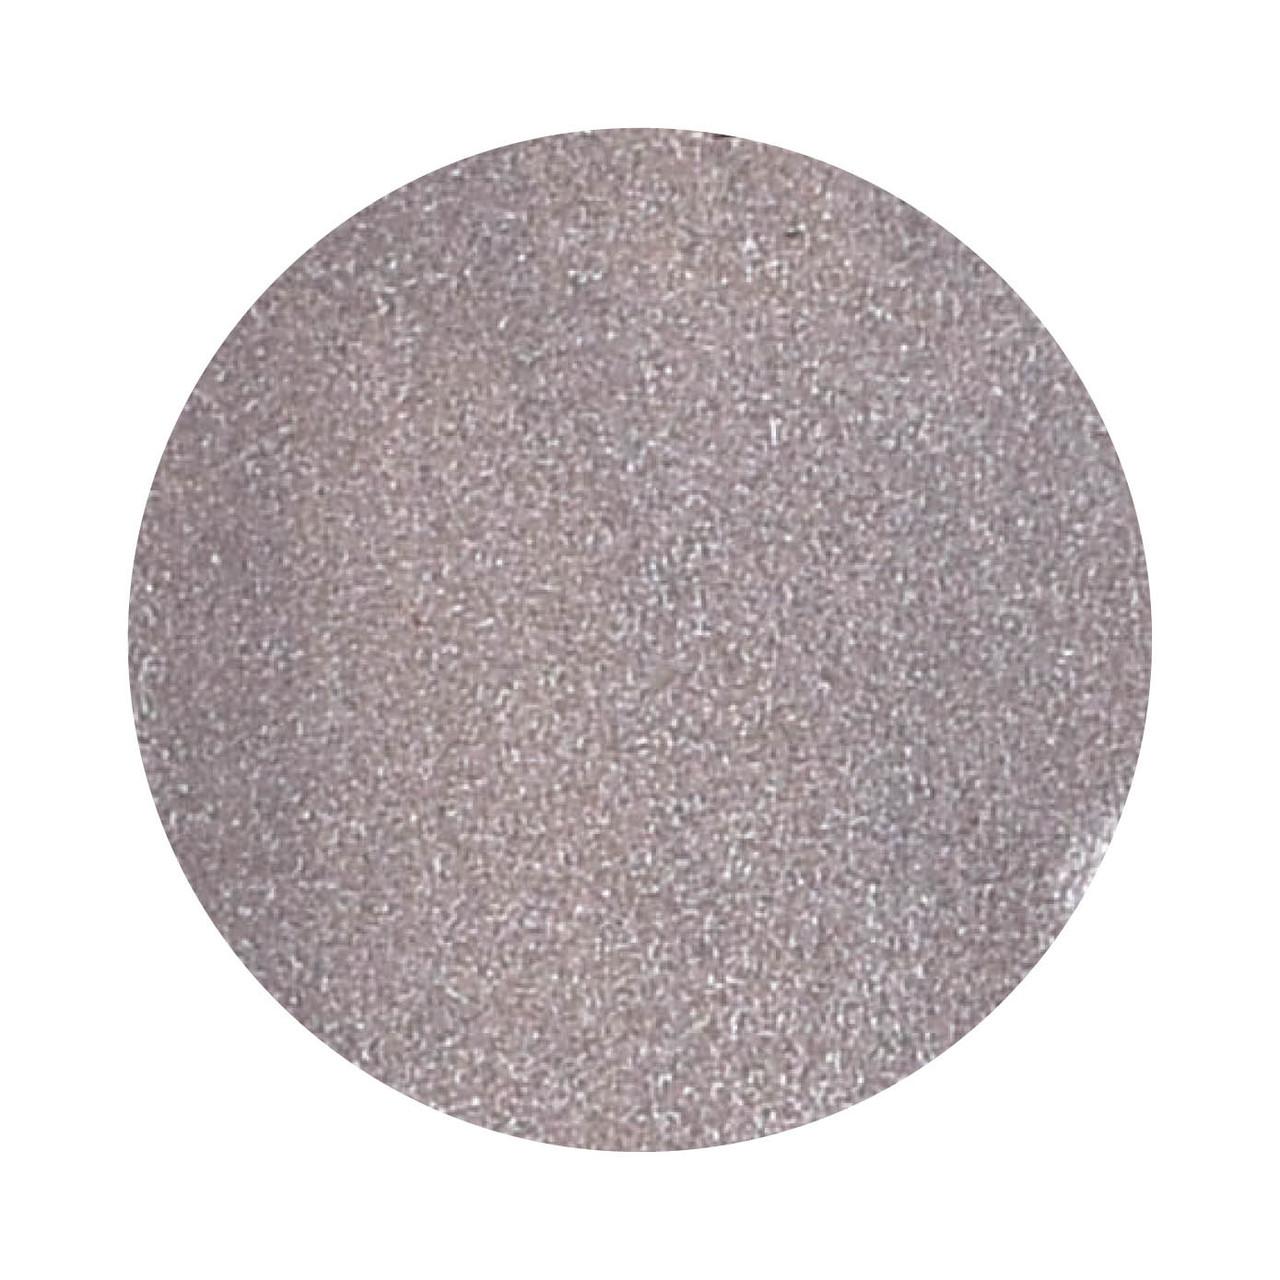 Dark Silver on fondant